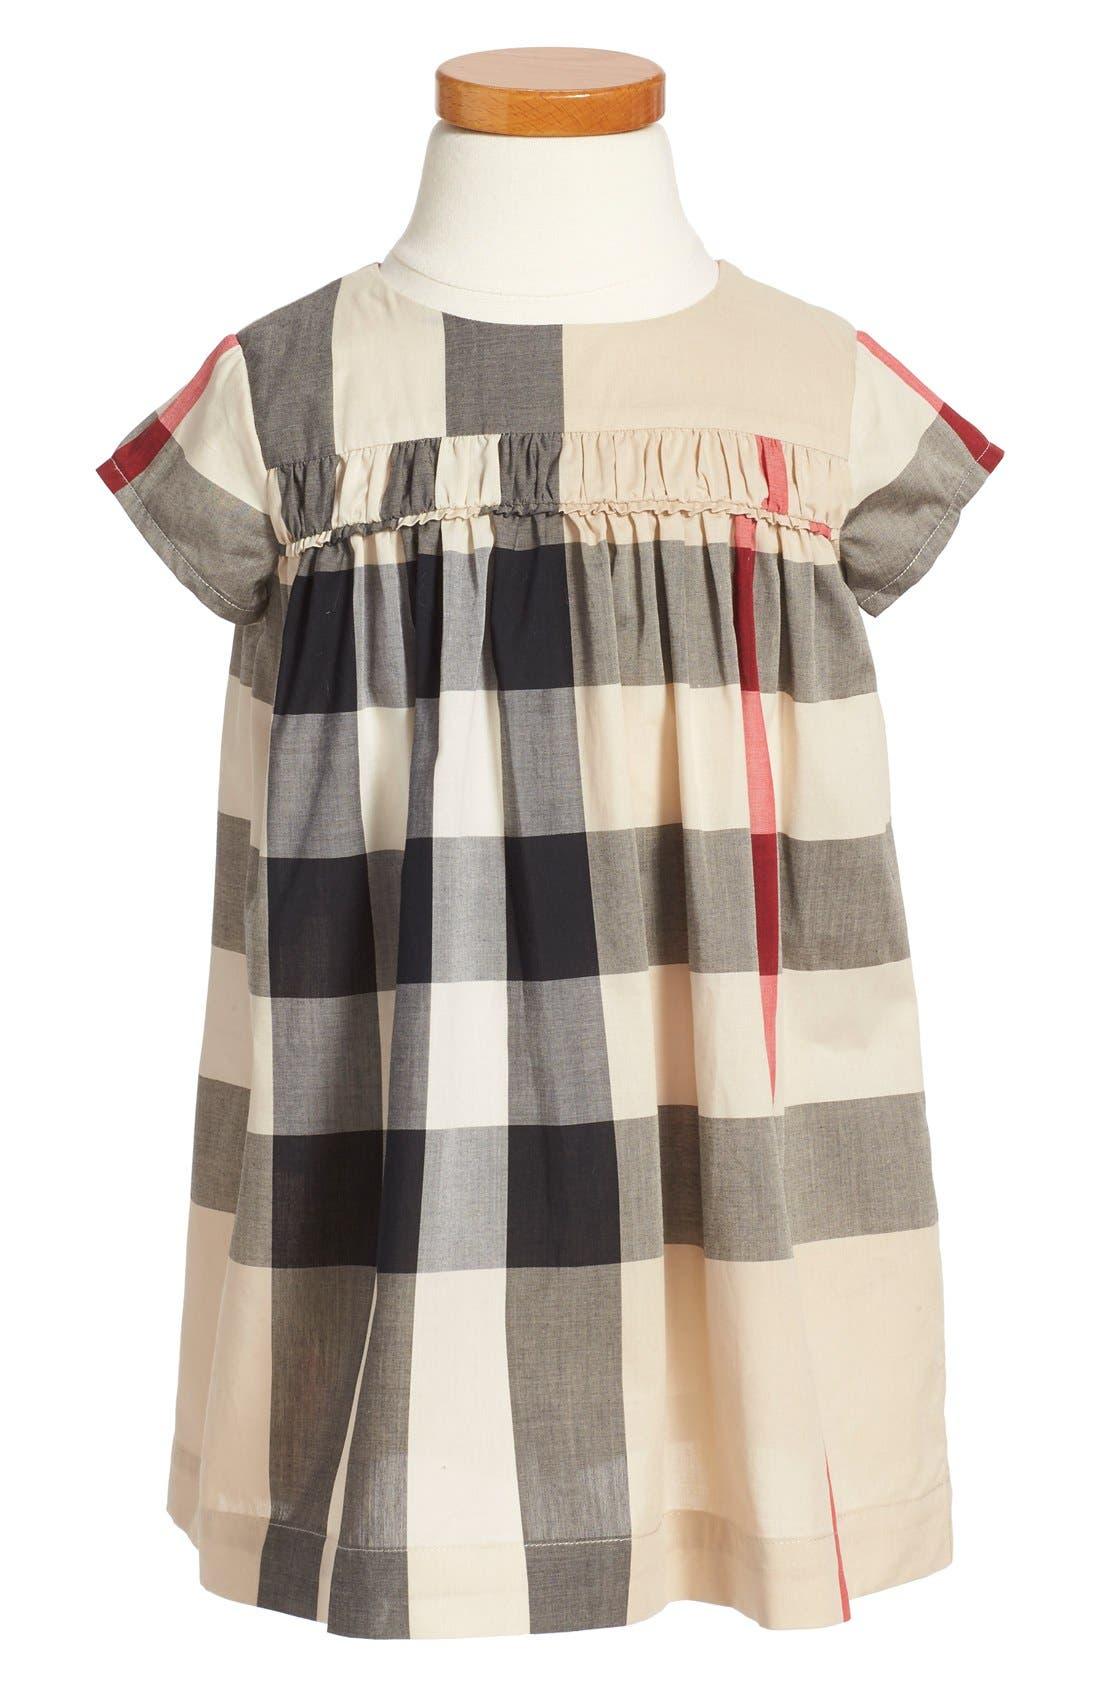 Alternate Image 1 Selected - Burberry 'Ariadne' Check Woven Dress (Toddler Girls)